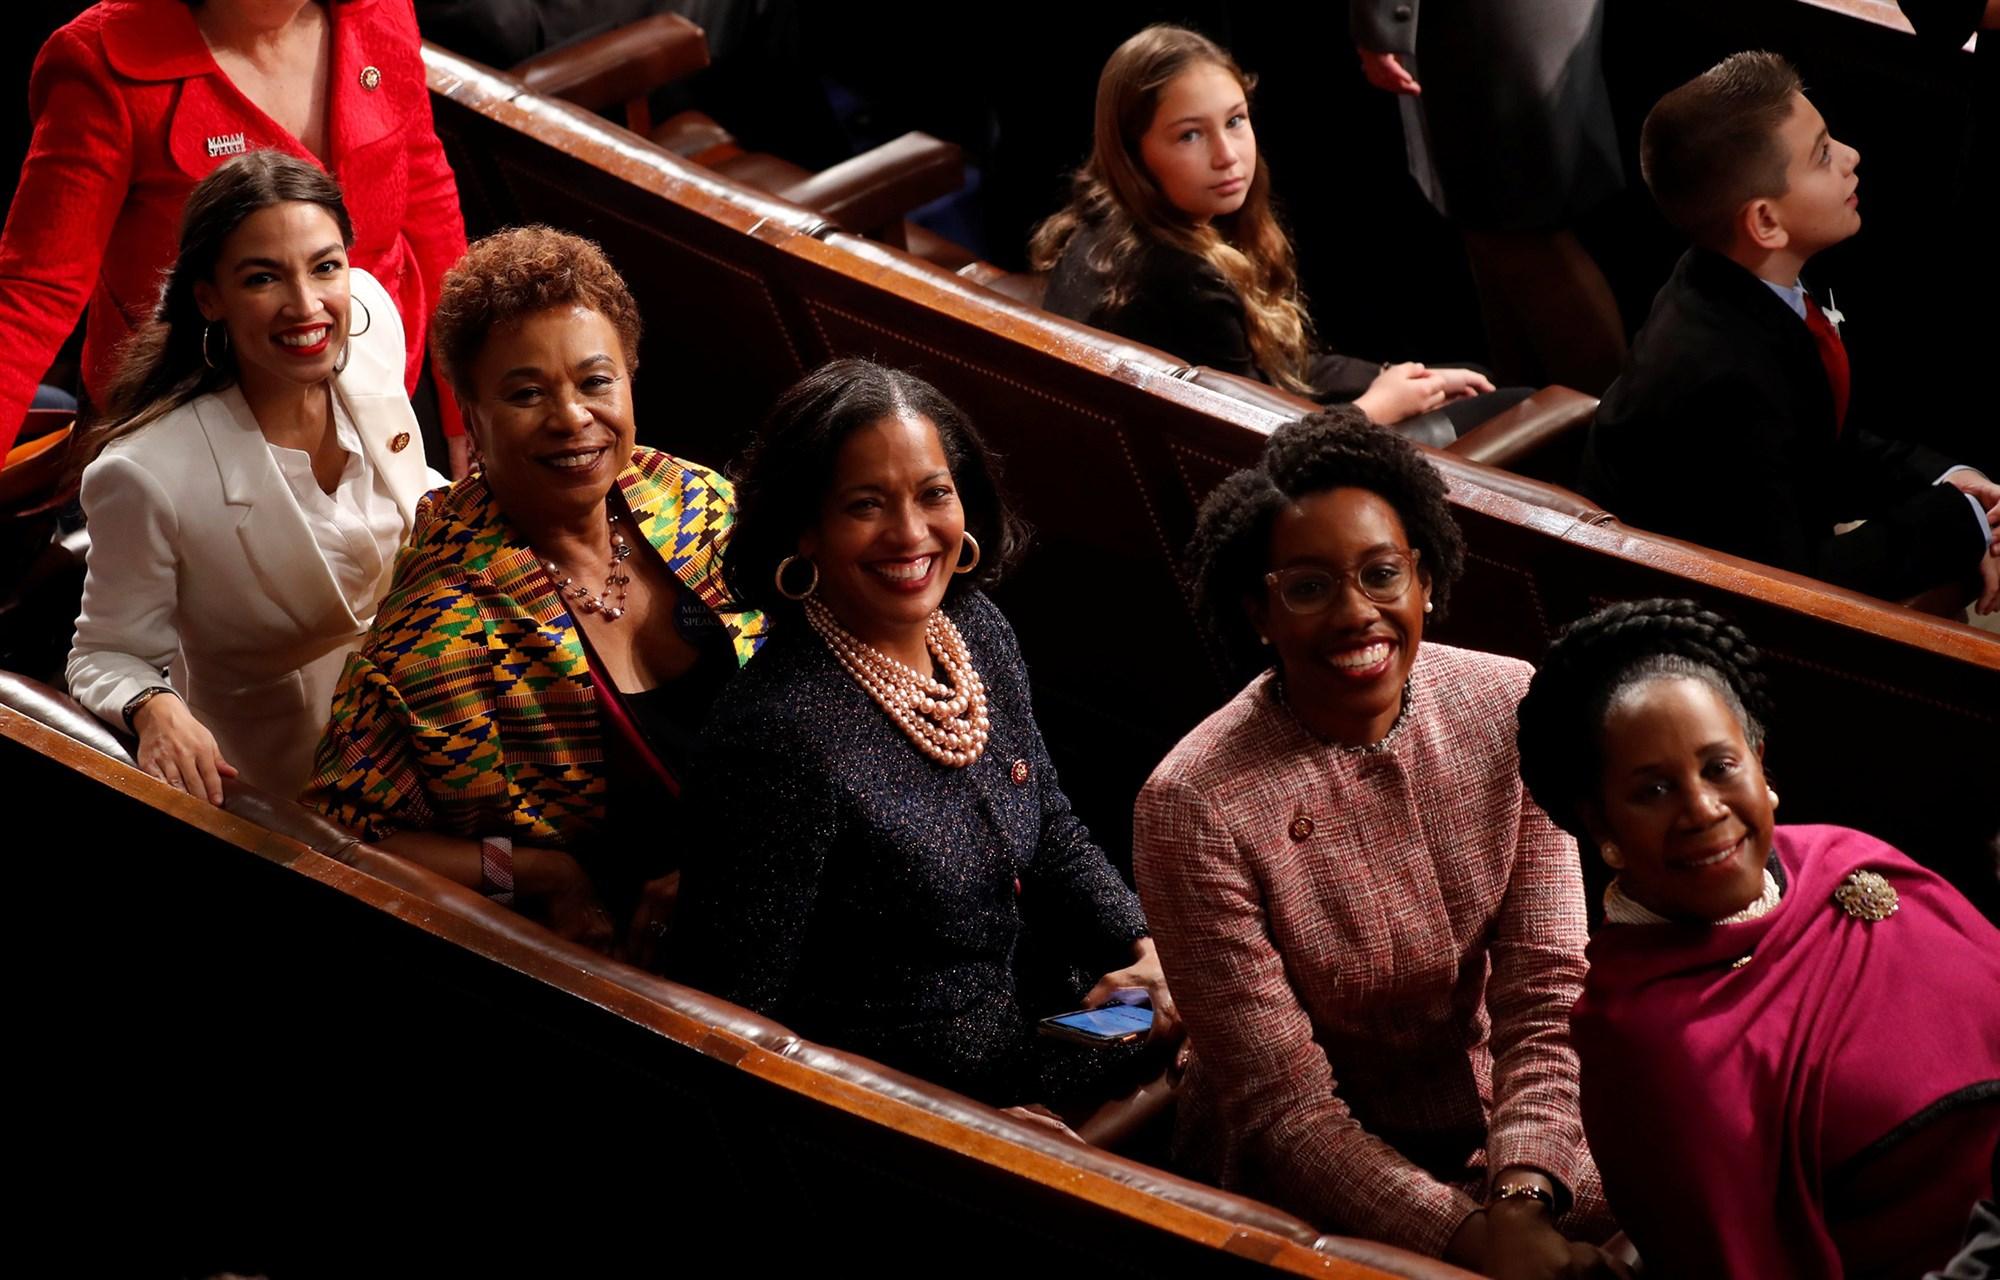 190307-rep-congress-women-ac-559p_1007868f97f15cfbfe8469d1b0caf105.fit-2000w.jpg